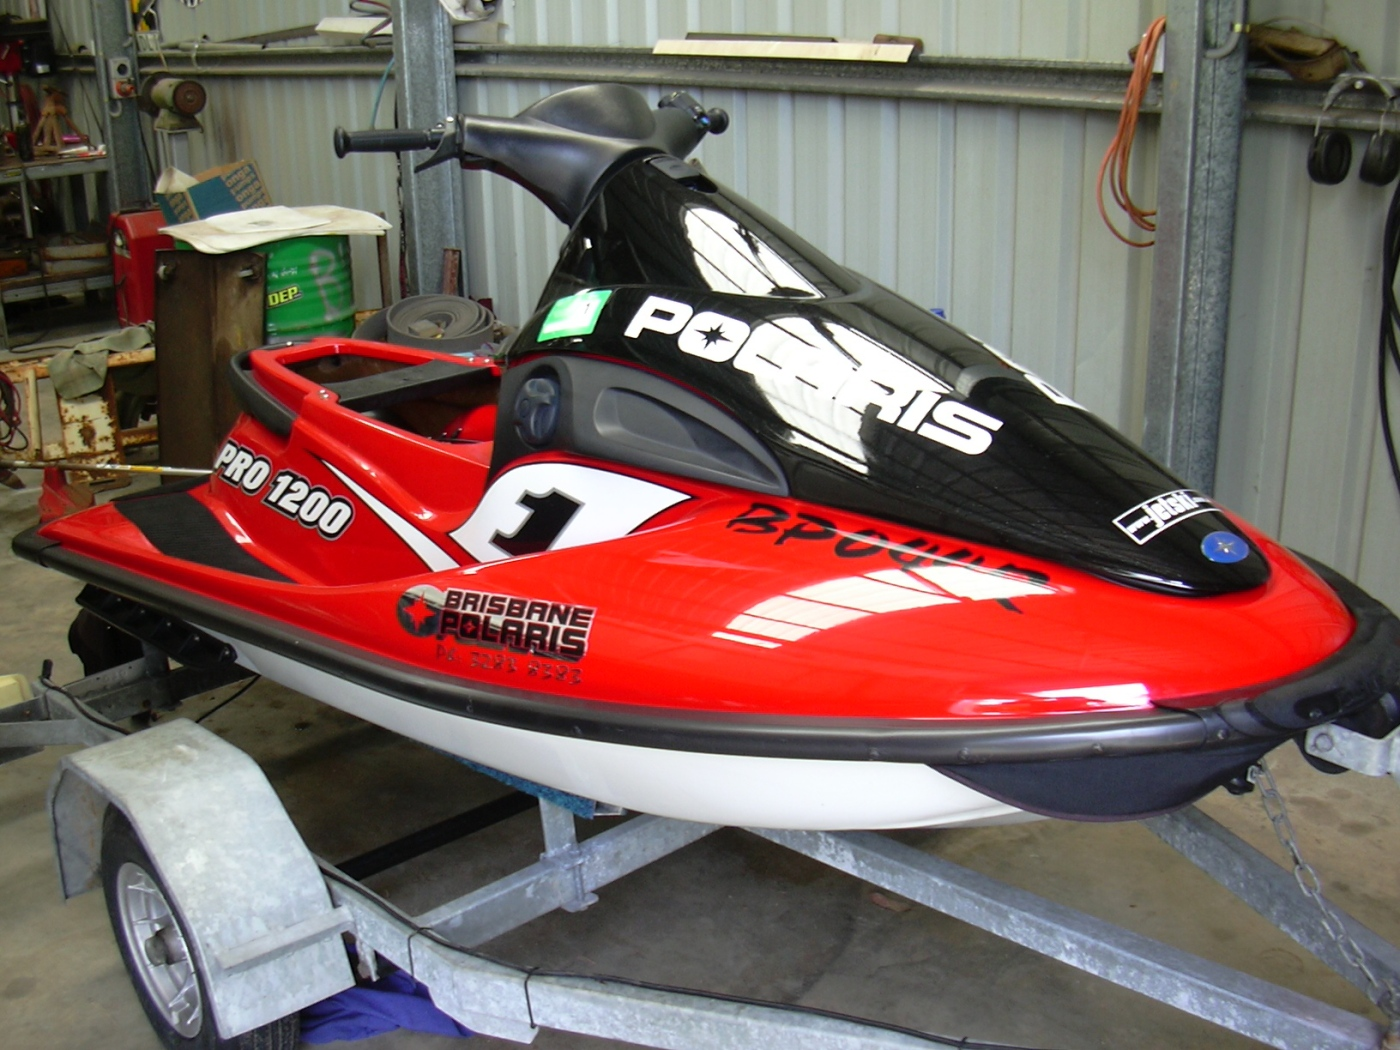 Manuales Taller - mecanica - despiece Jet Ski Polaris-motos de Agua Polaris en pdf